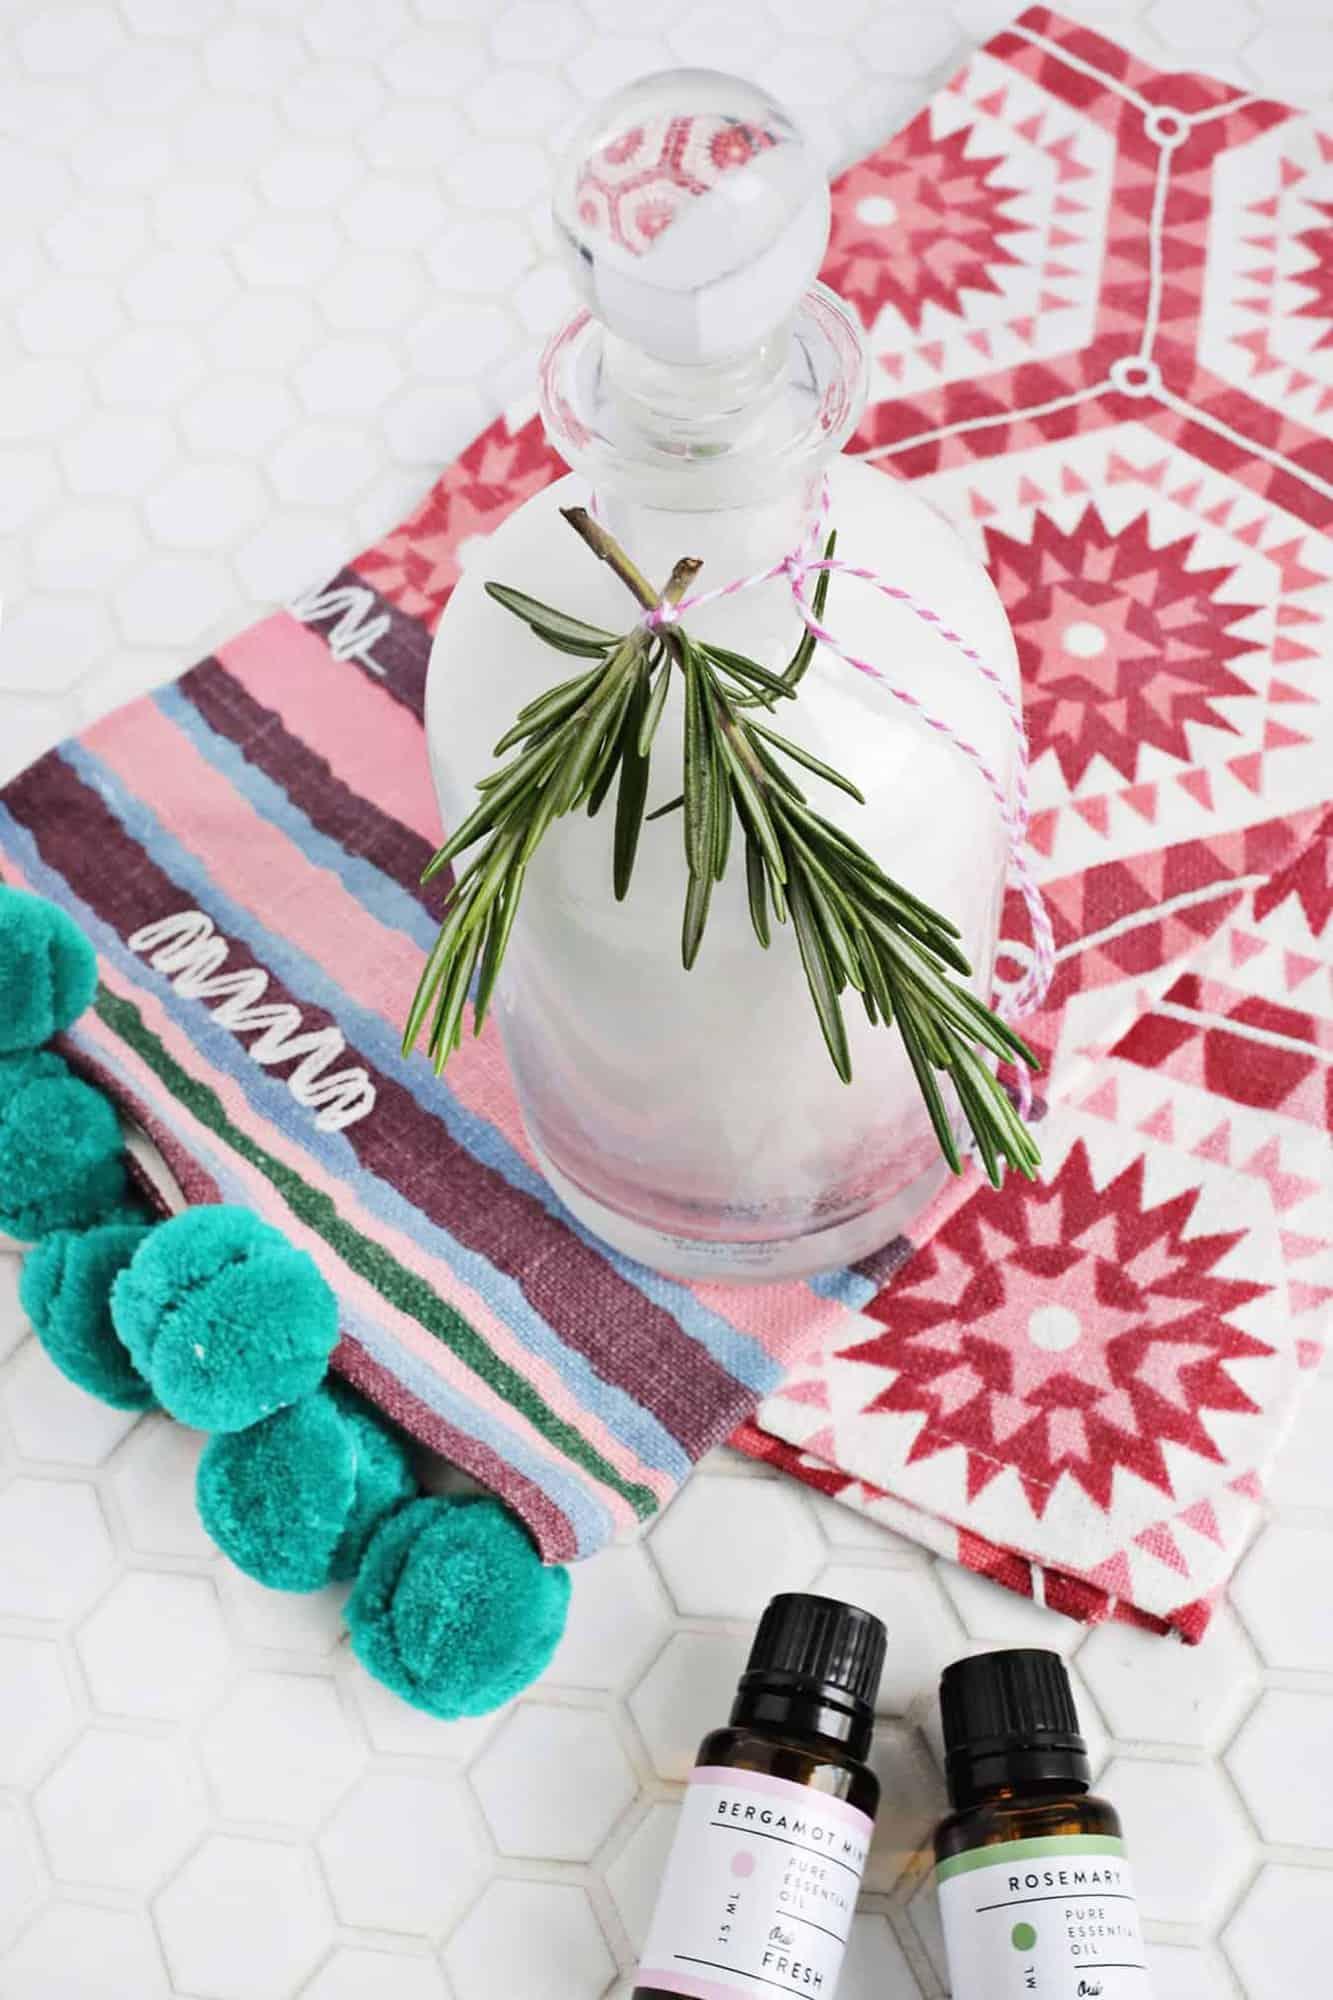 Rosemary mint bath salt DIY